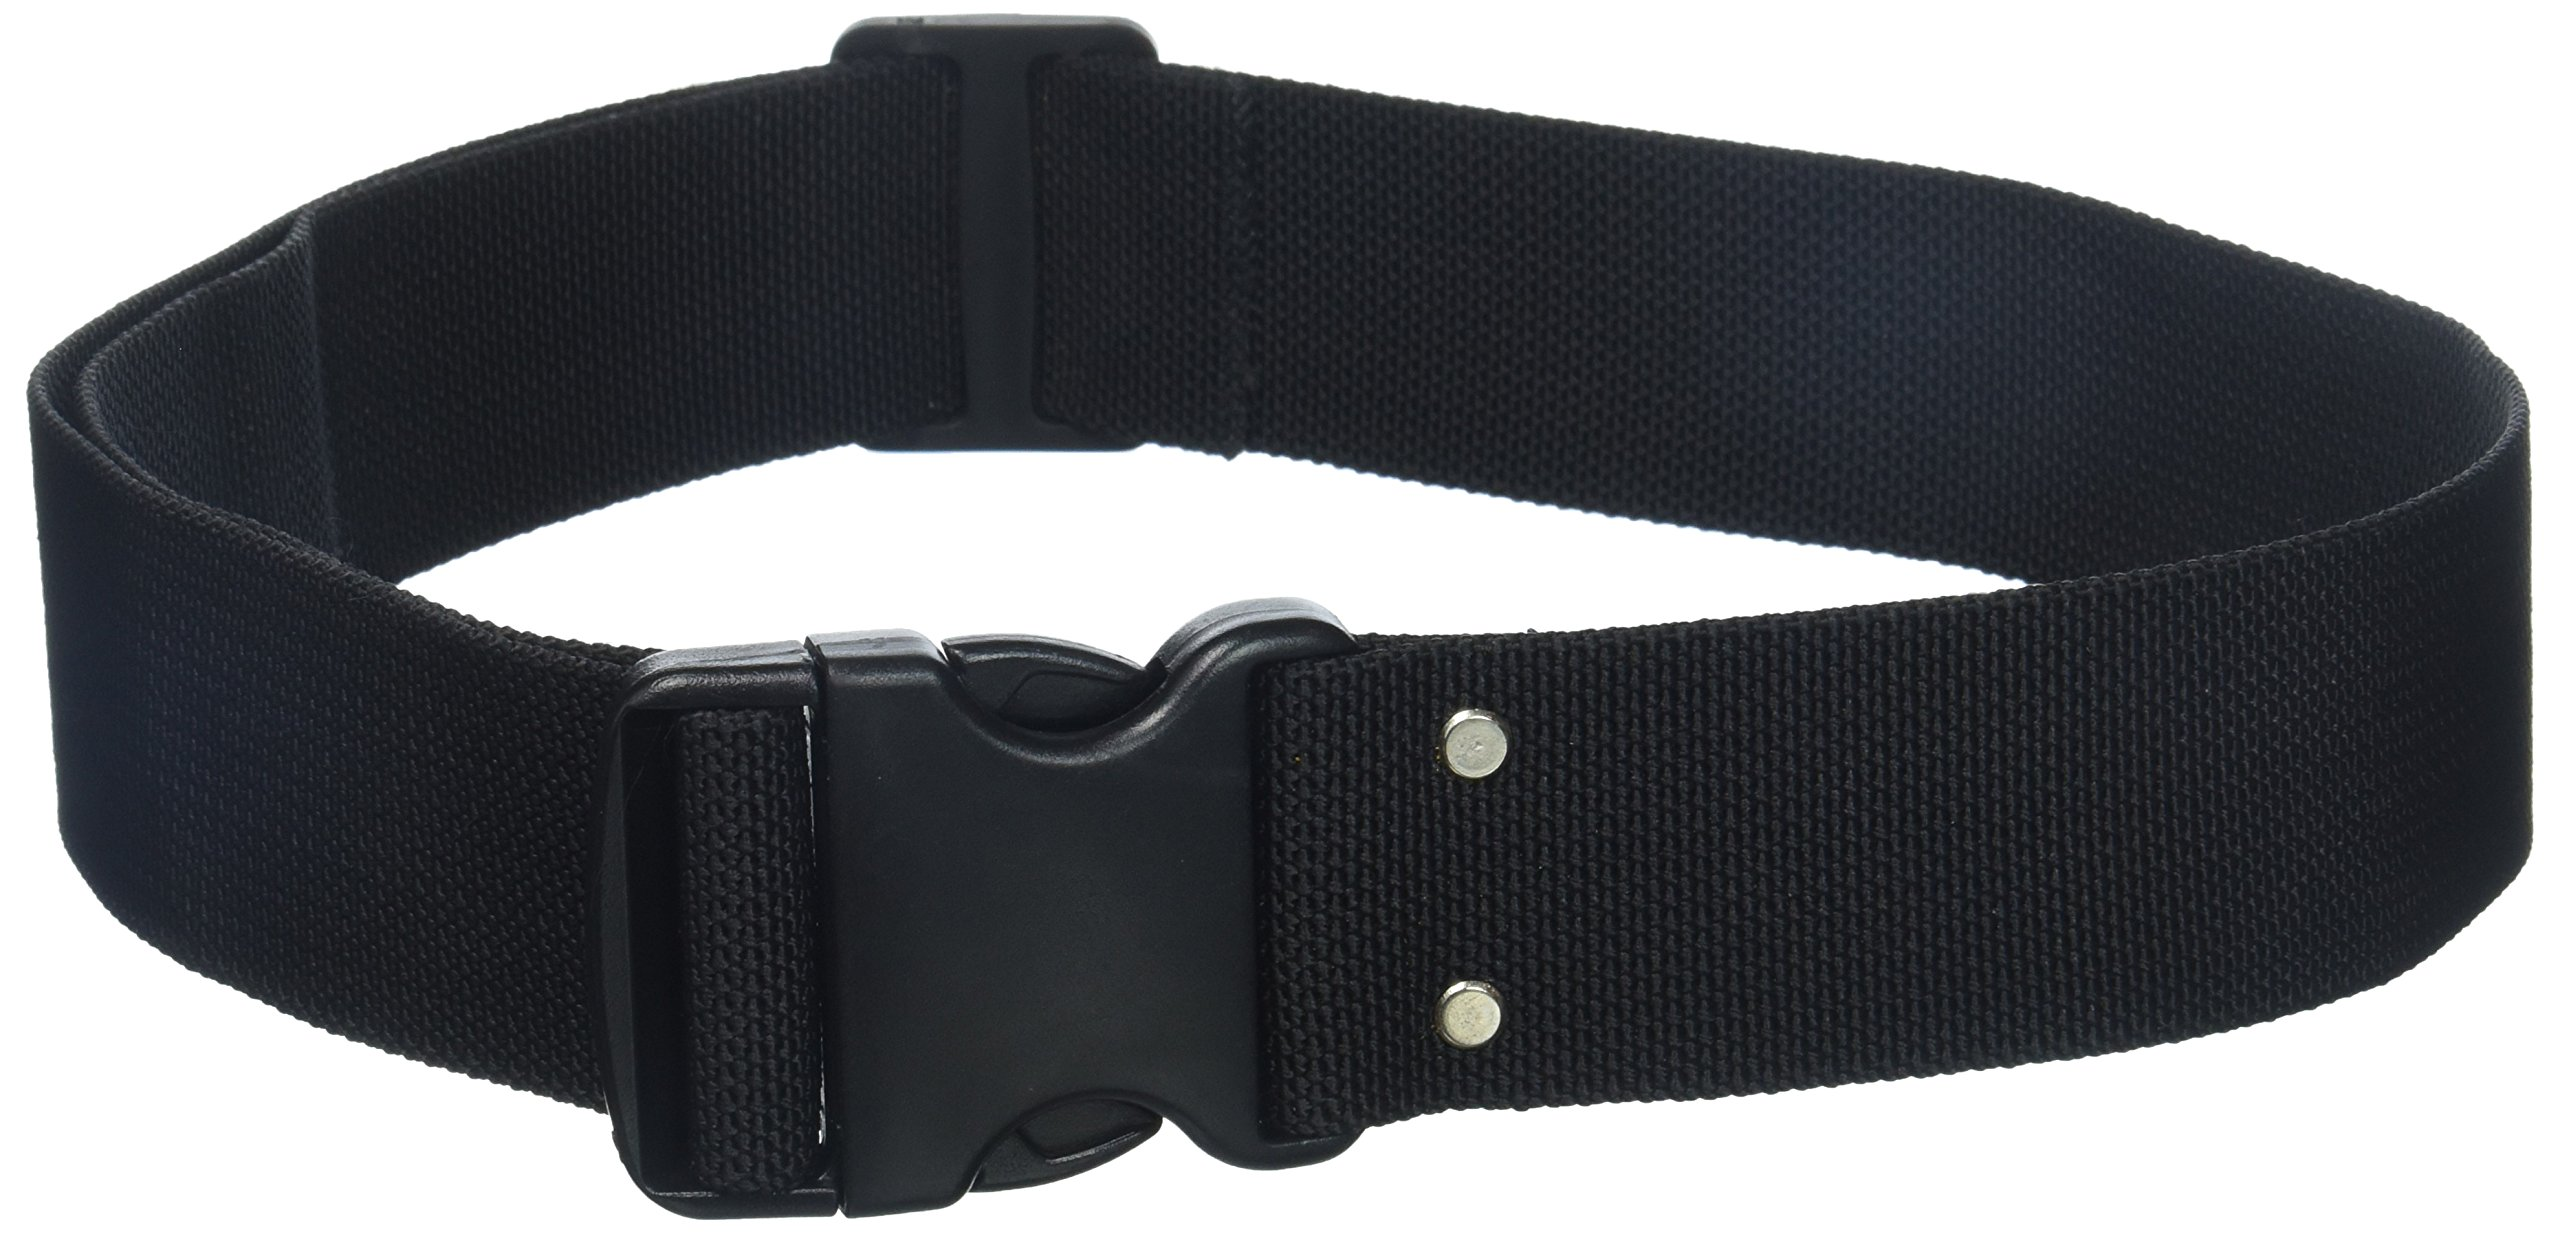 Style n Craft 95-010 Black Polyweb Tool Work Belt